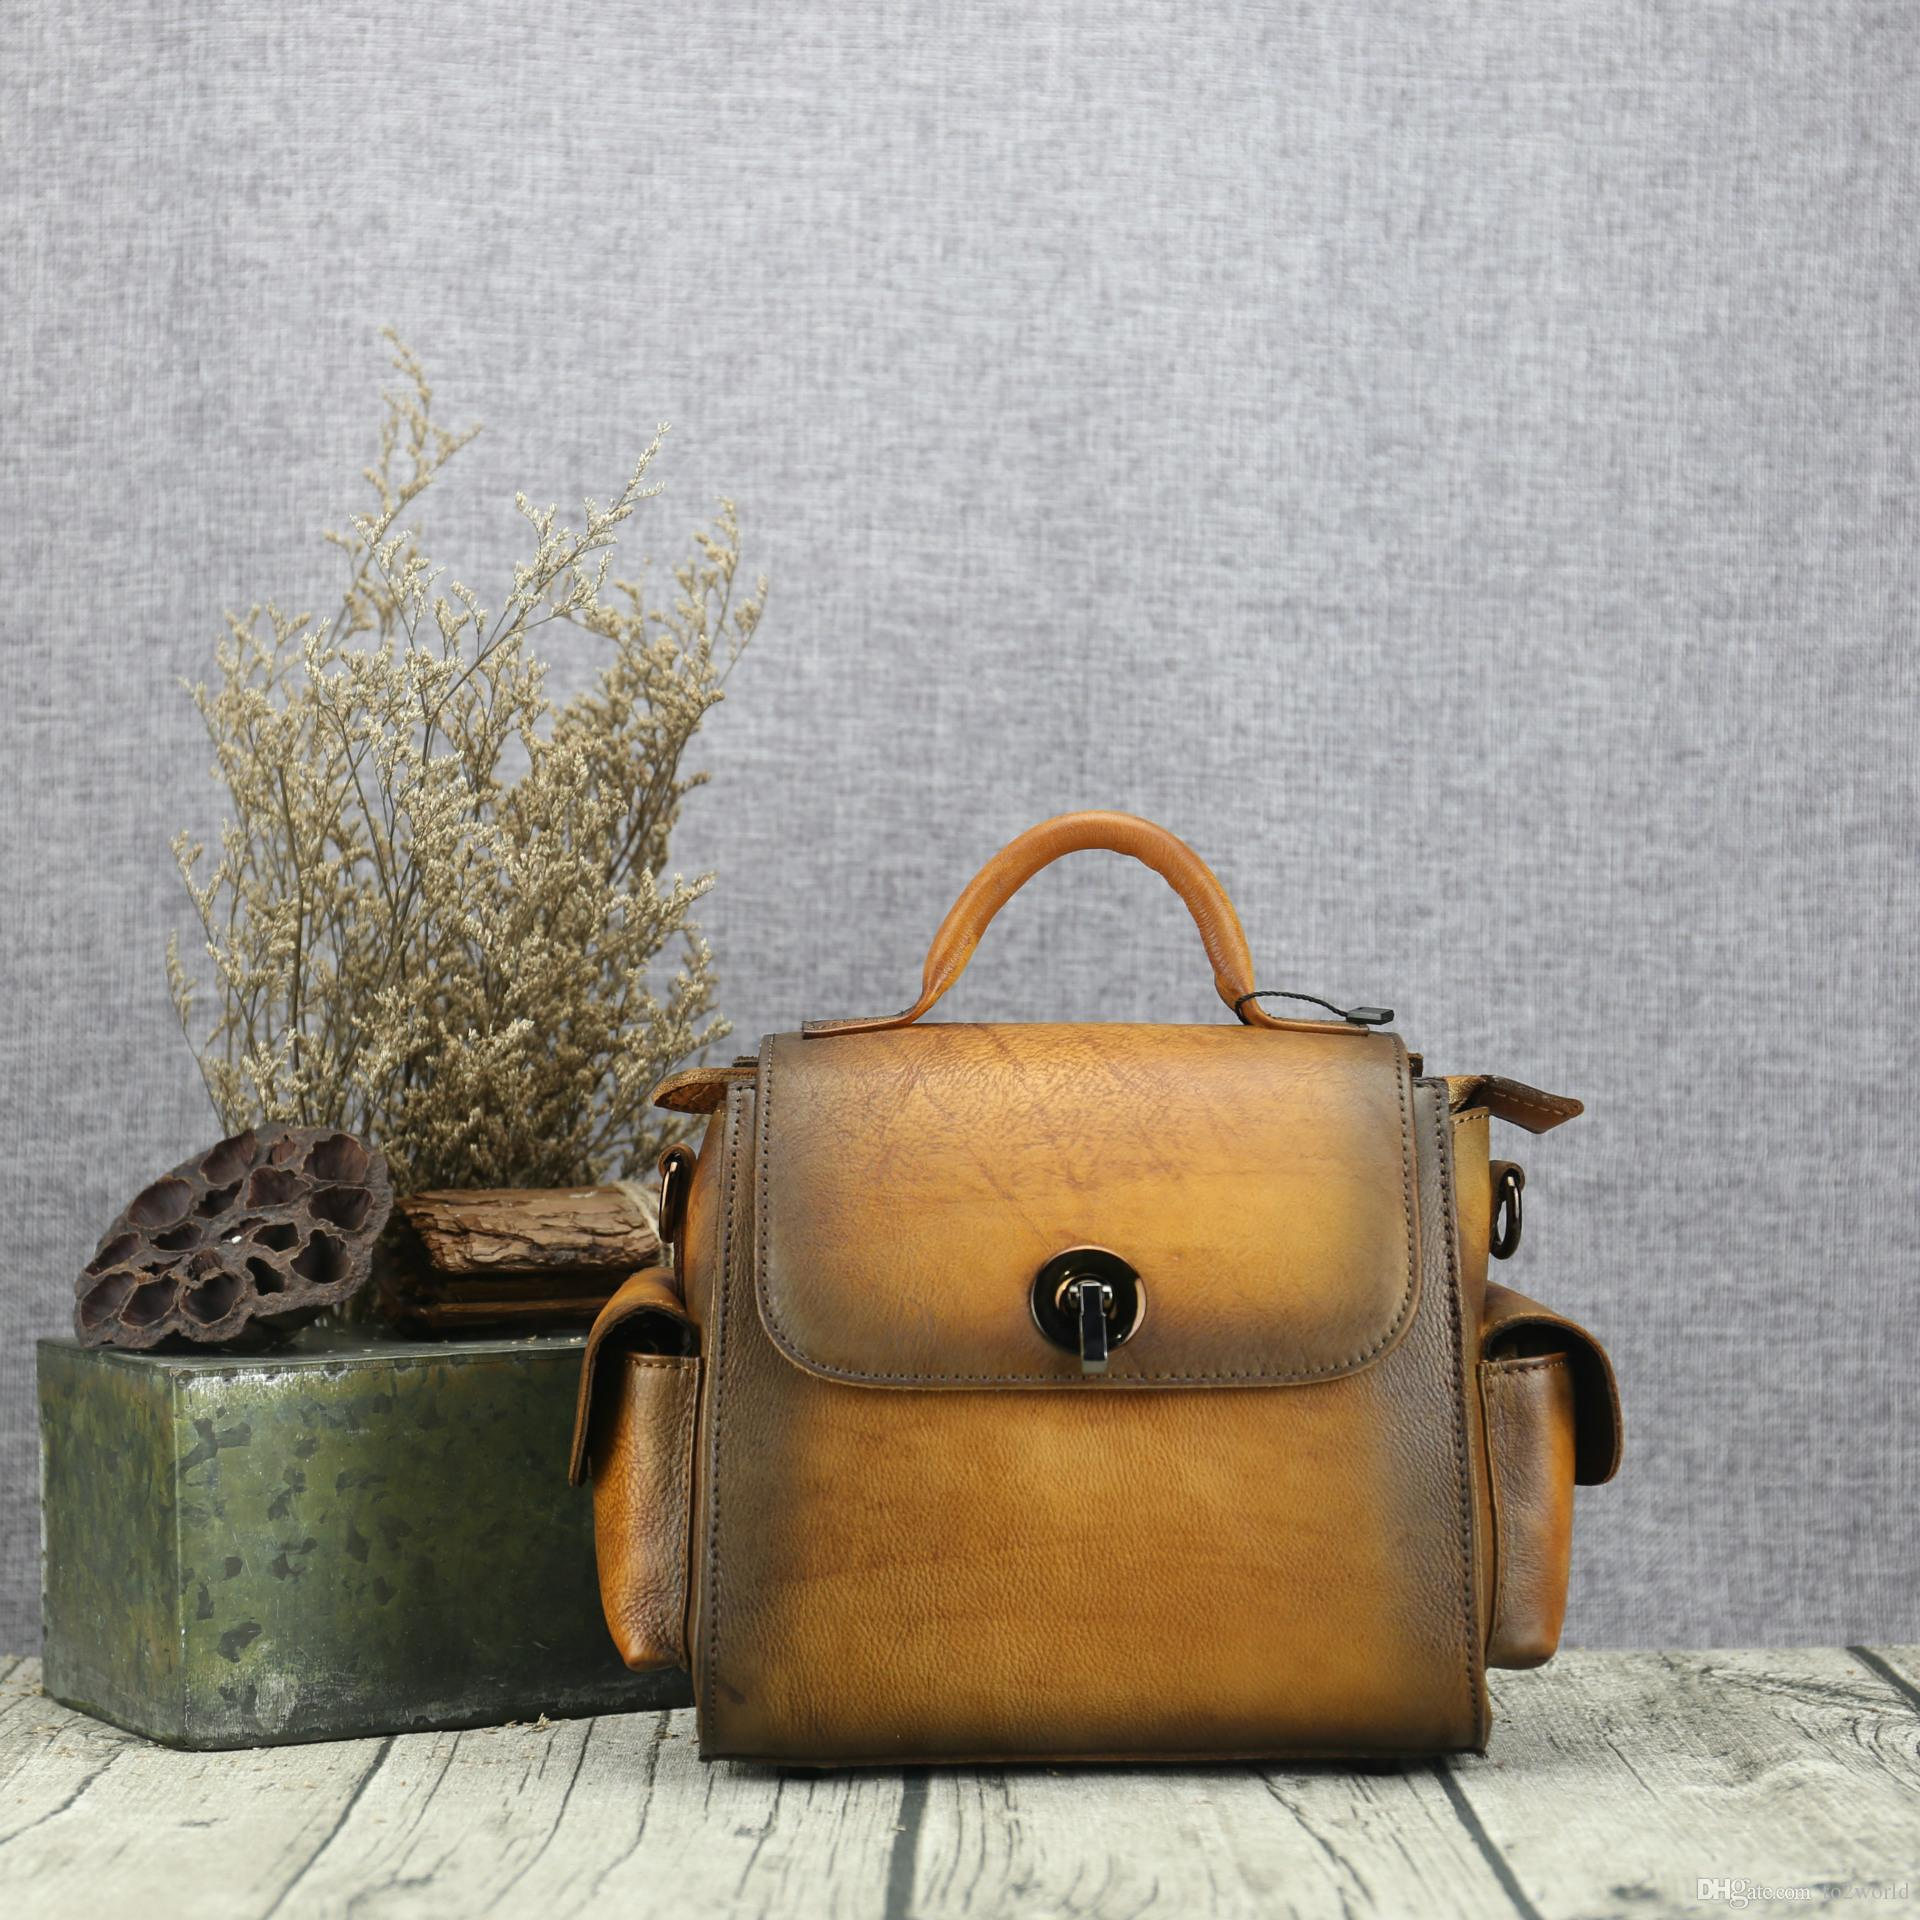 Designer Bags All Brands bag women bag fashion gift lovely bags christmas gift bag cosmetic travel bags free ship